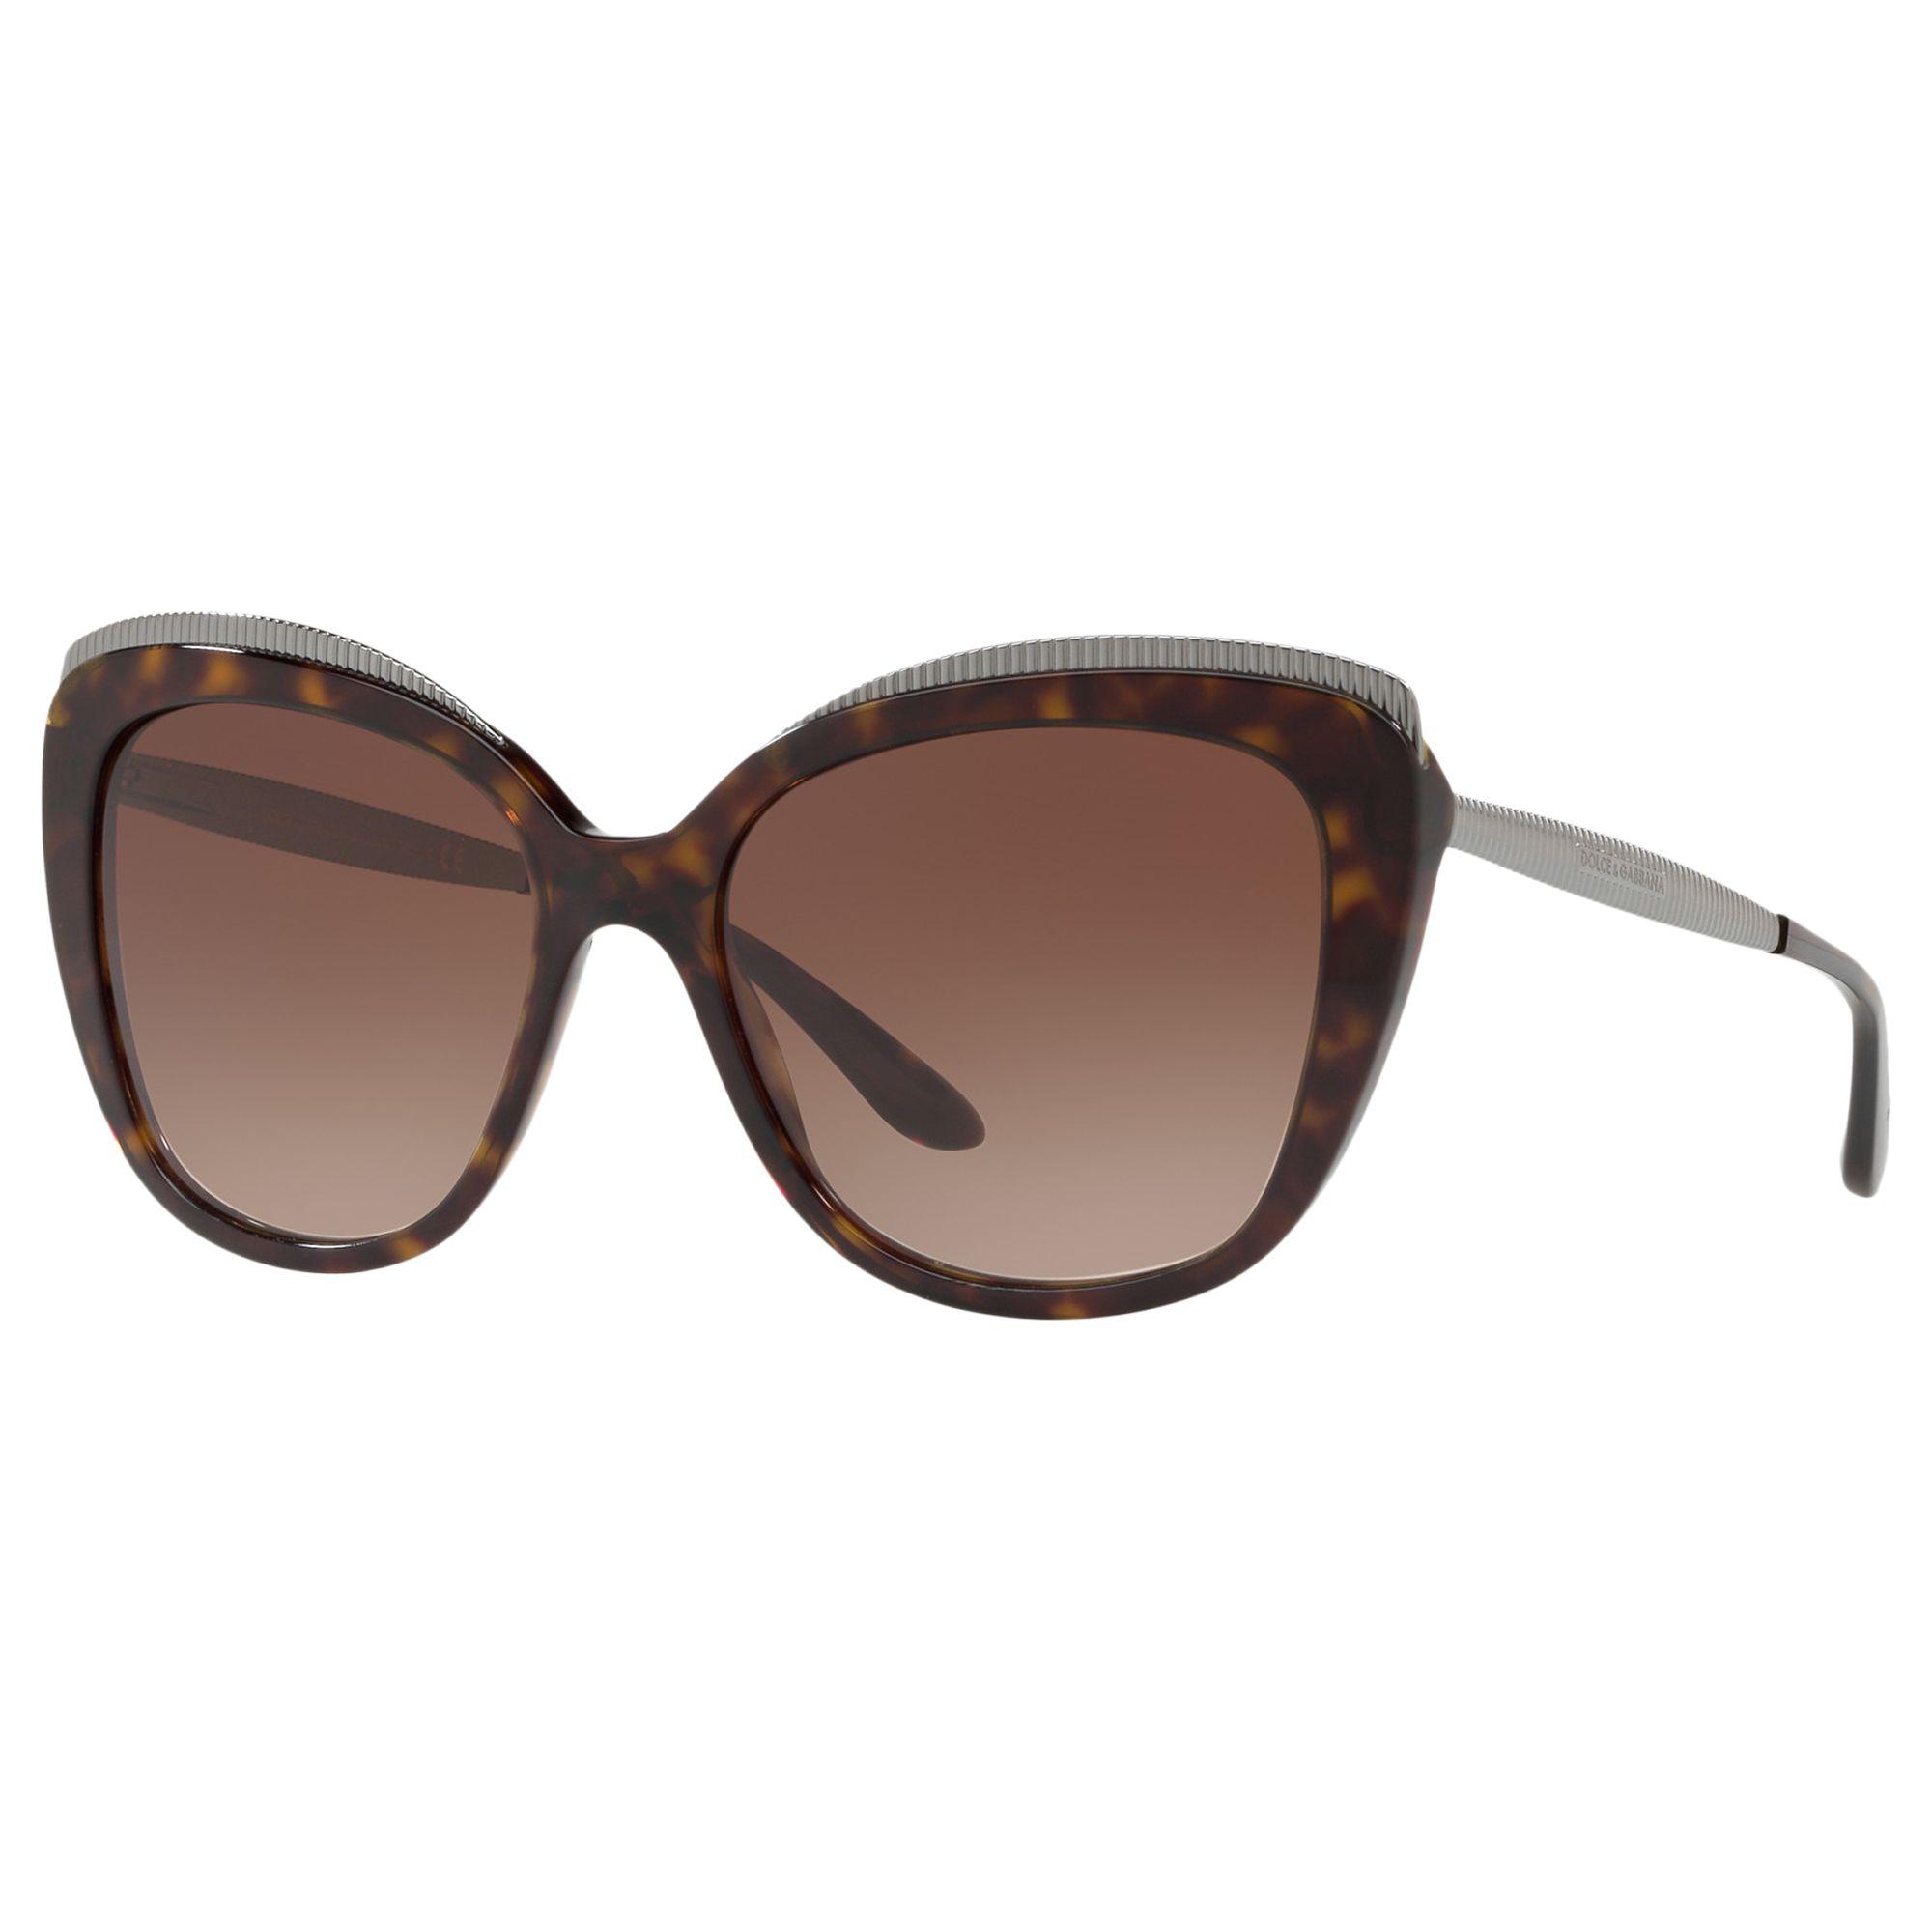 06511e2fa Dolce & Gabbana 4332 Women's Cat-Eye Sunglasses, Brown at John Lewis &  Partners